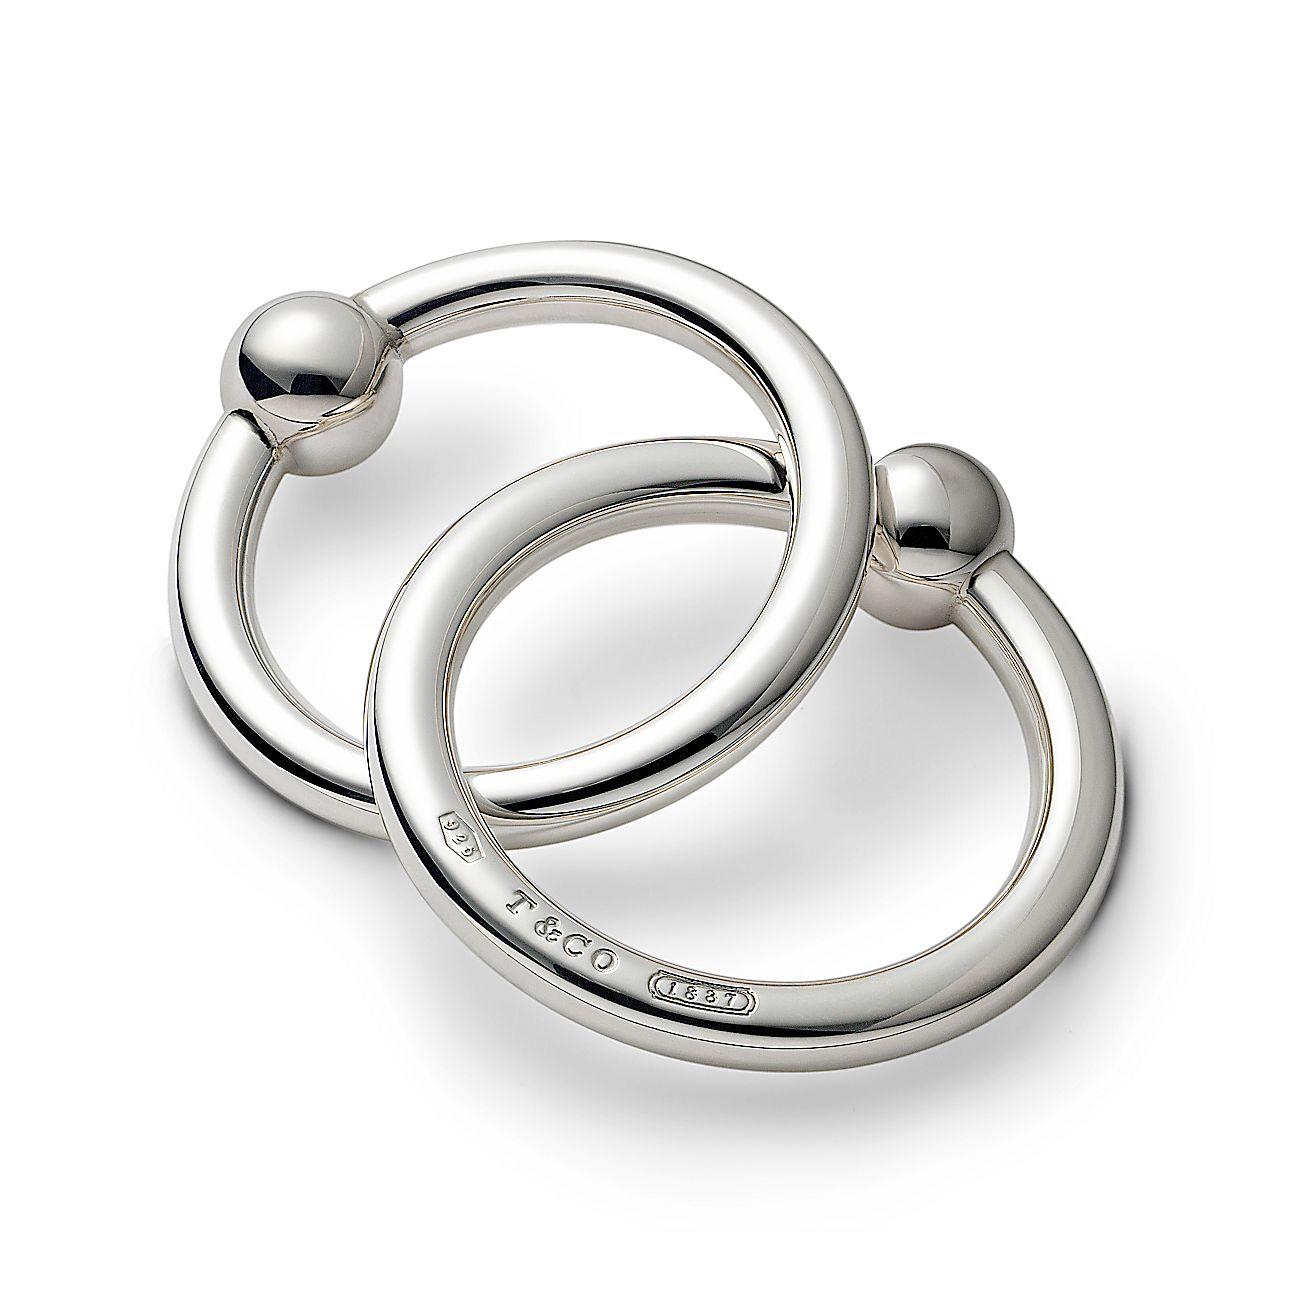 Tiffany Teething Ring Rattle